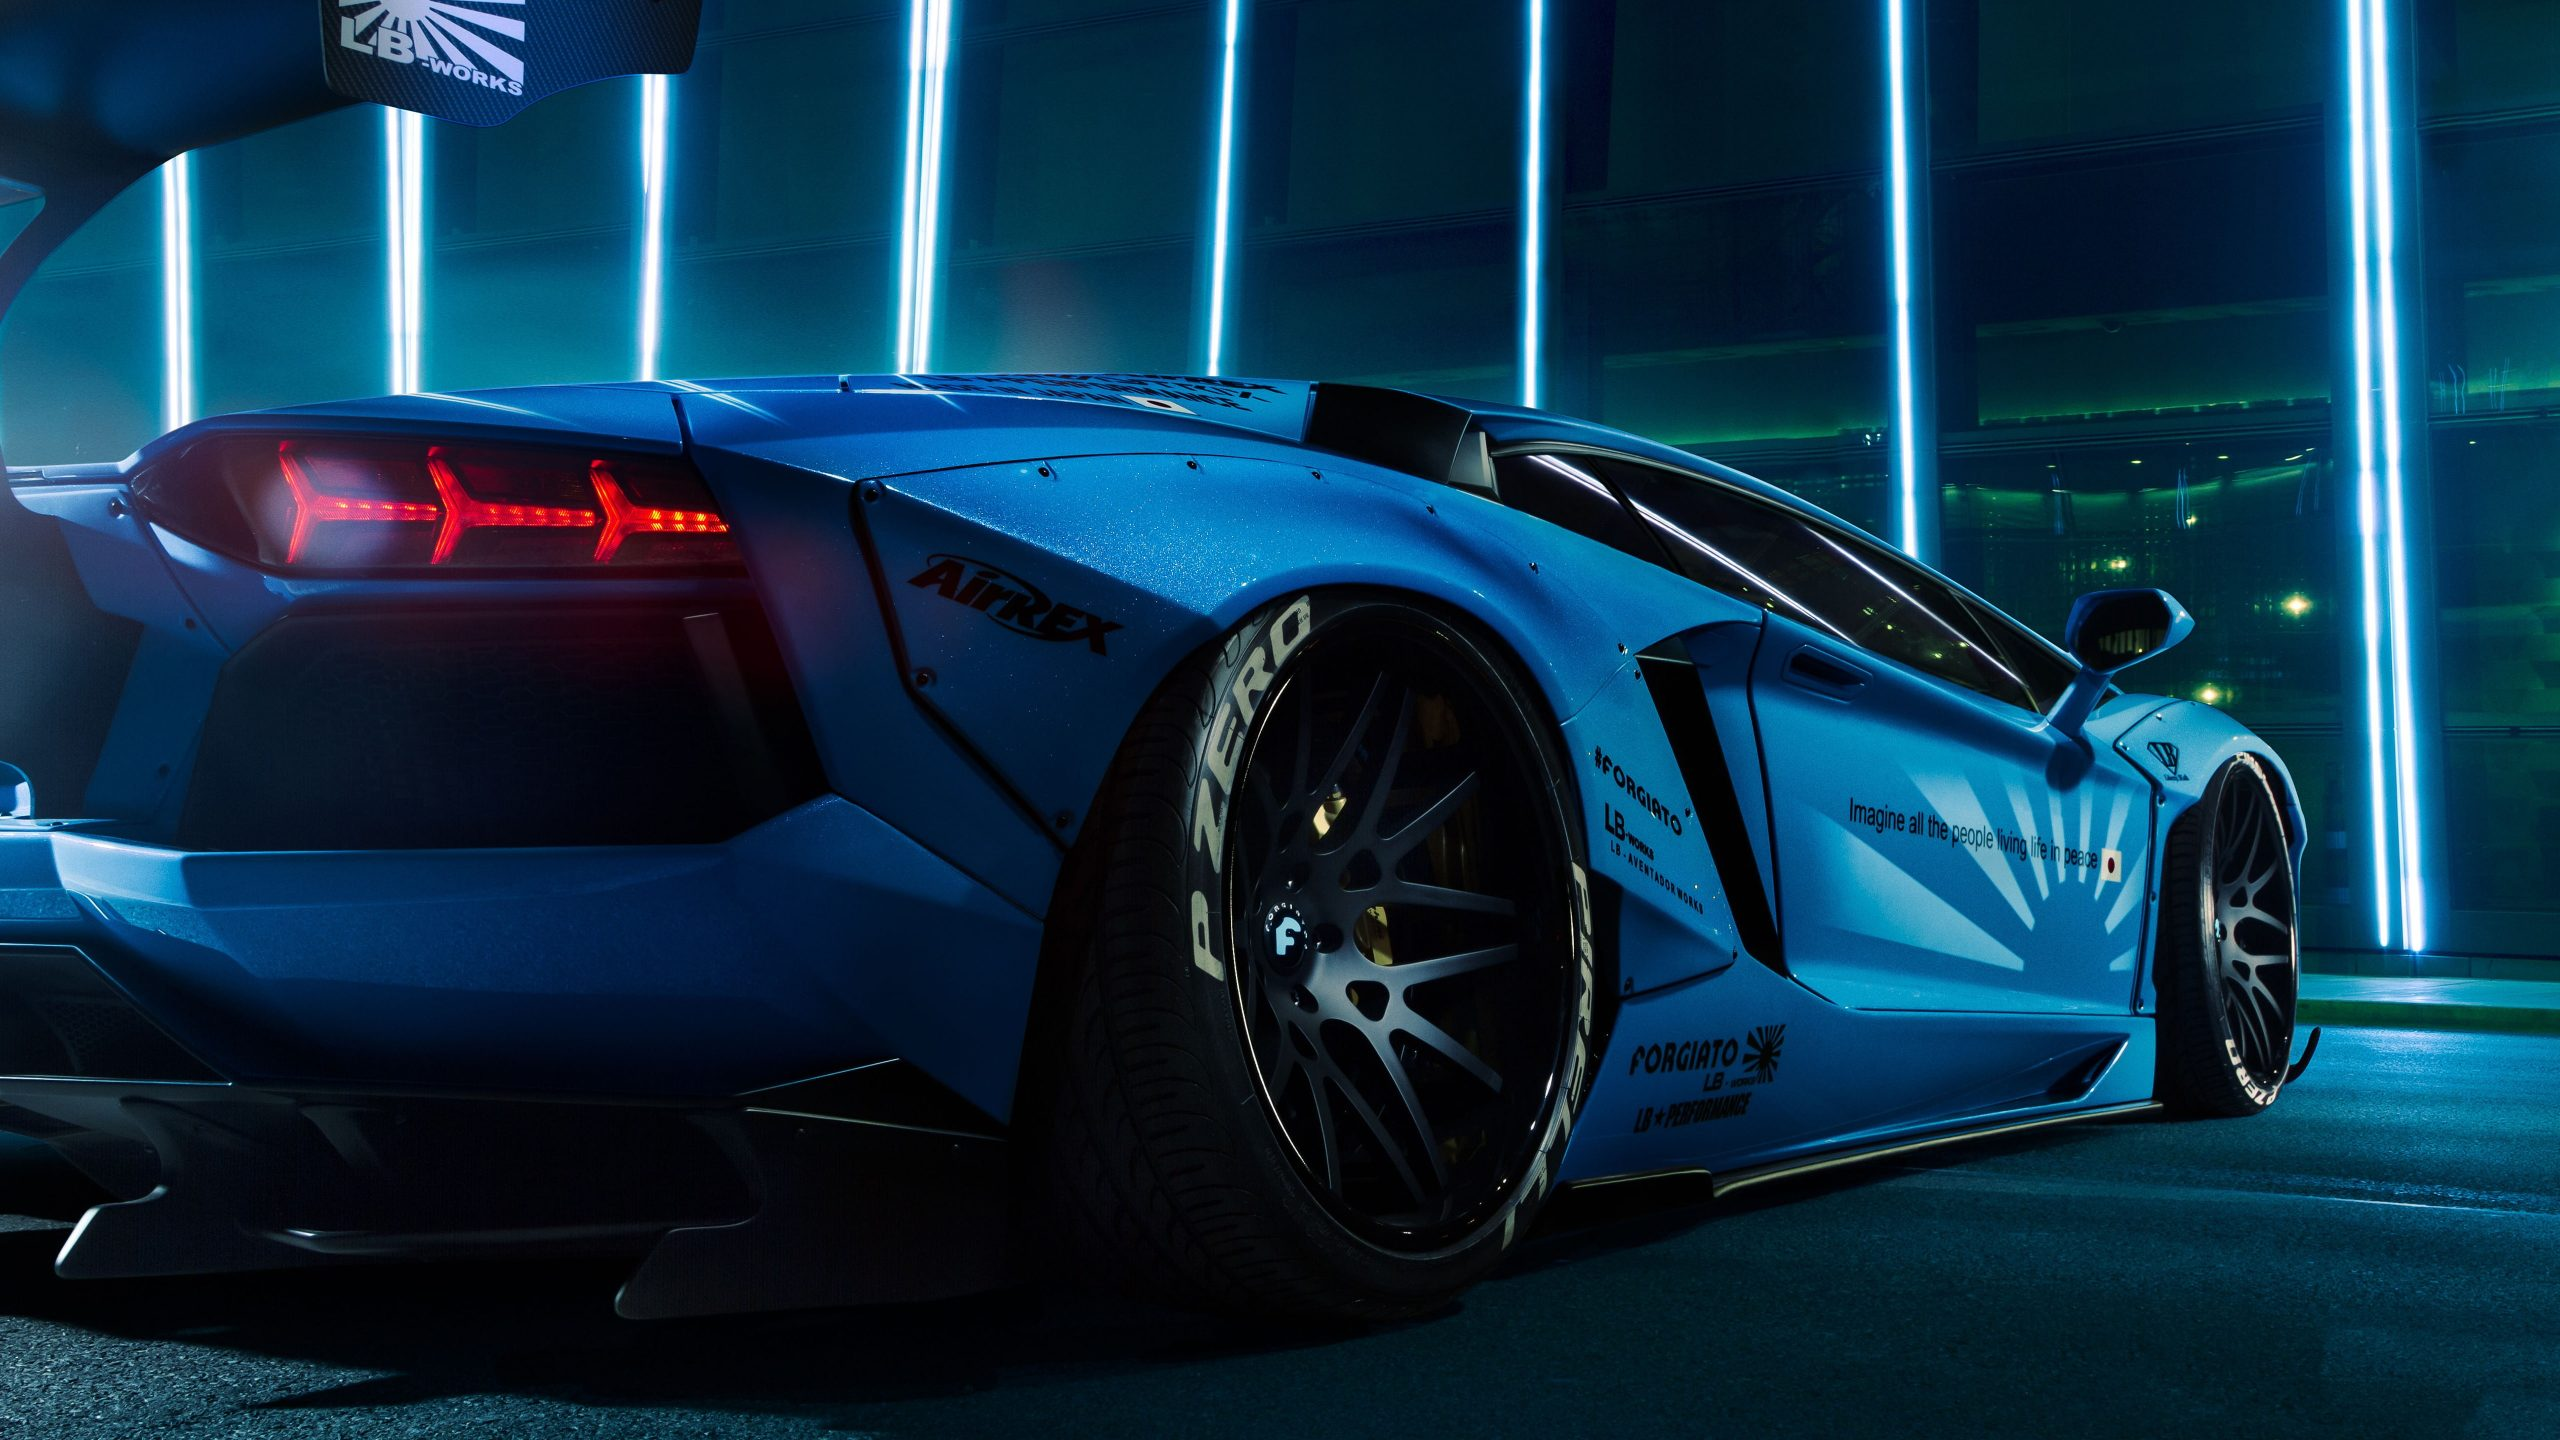 Sizing also makes later remov. Car Wallpaper Sports Car Supercar Lamborghini Aventador Blue Car Wallpaper For You Hd Wallpaper For Desktop Mobile